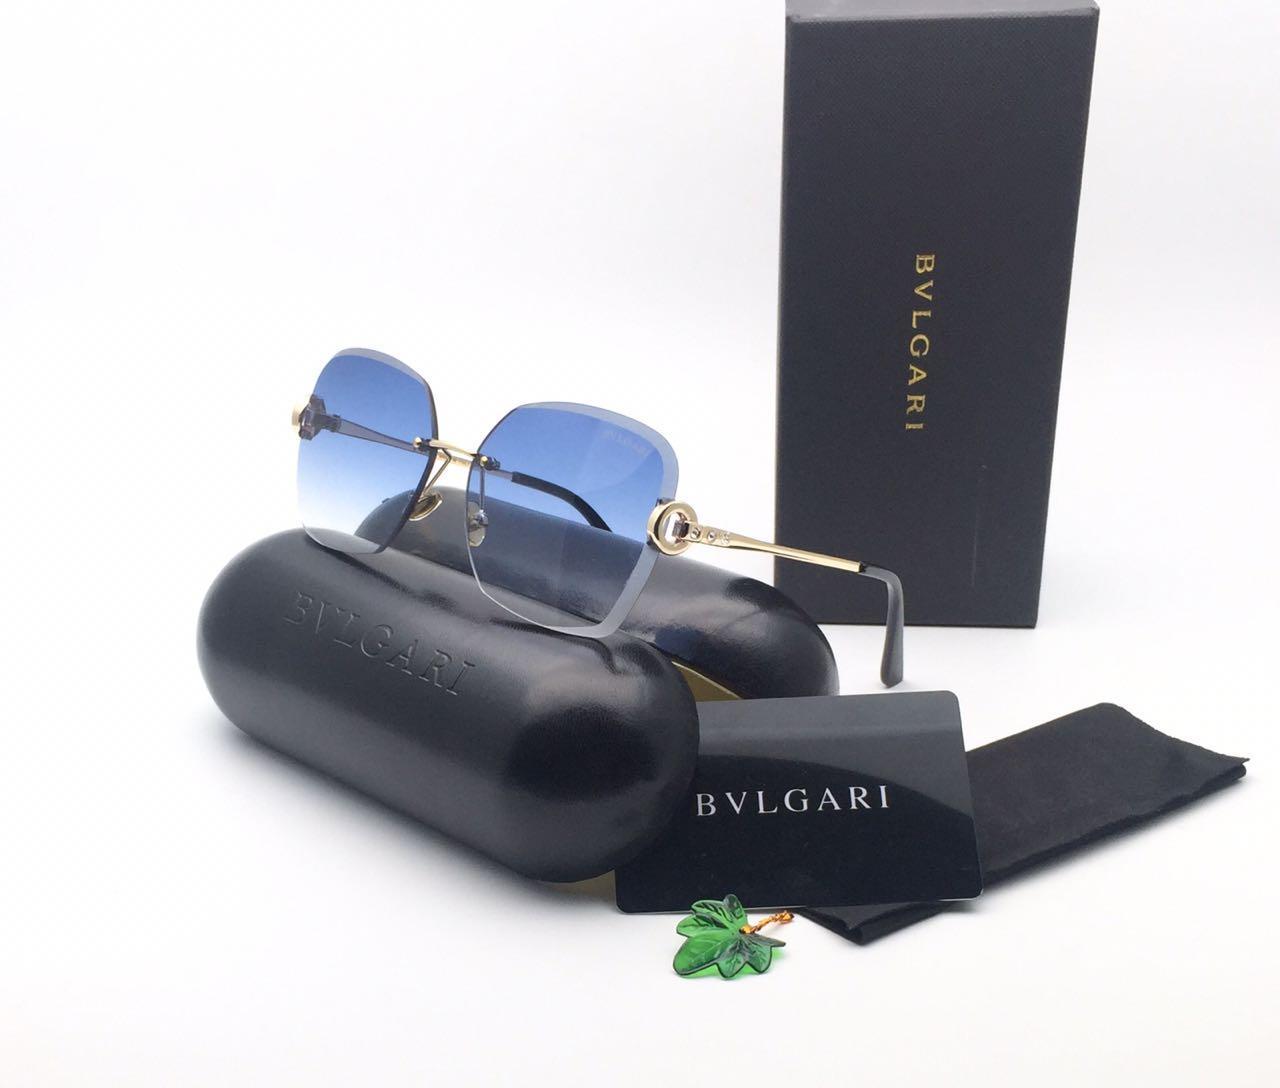 Kacamata Wanita Archives Harga Murah Sunglass Dior 84 Terbaru Sunglasses New For Women